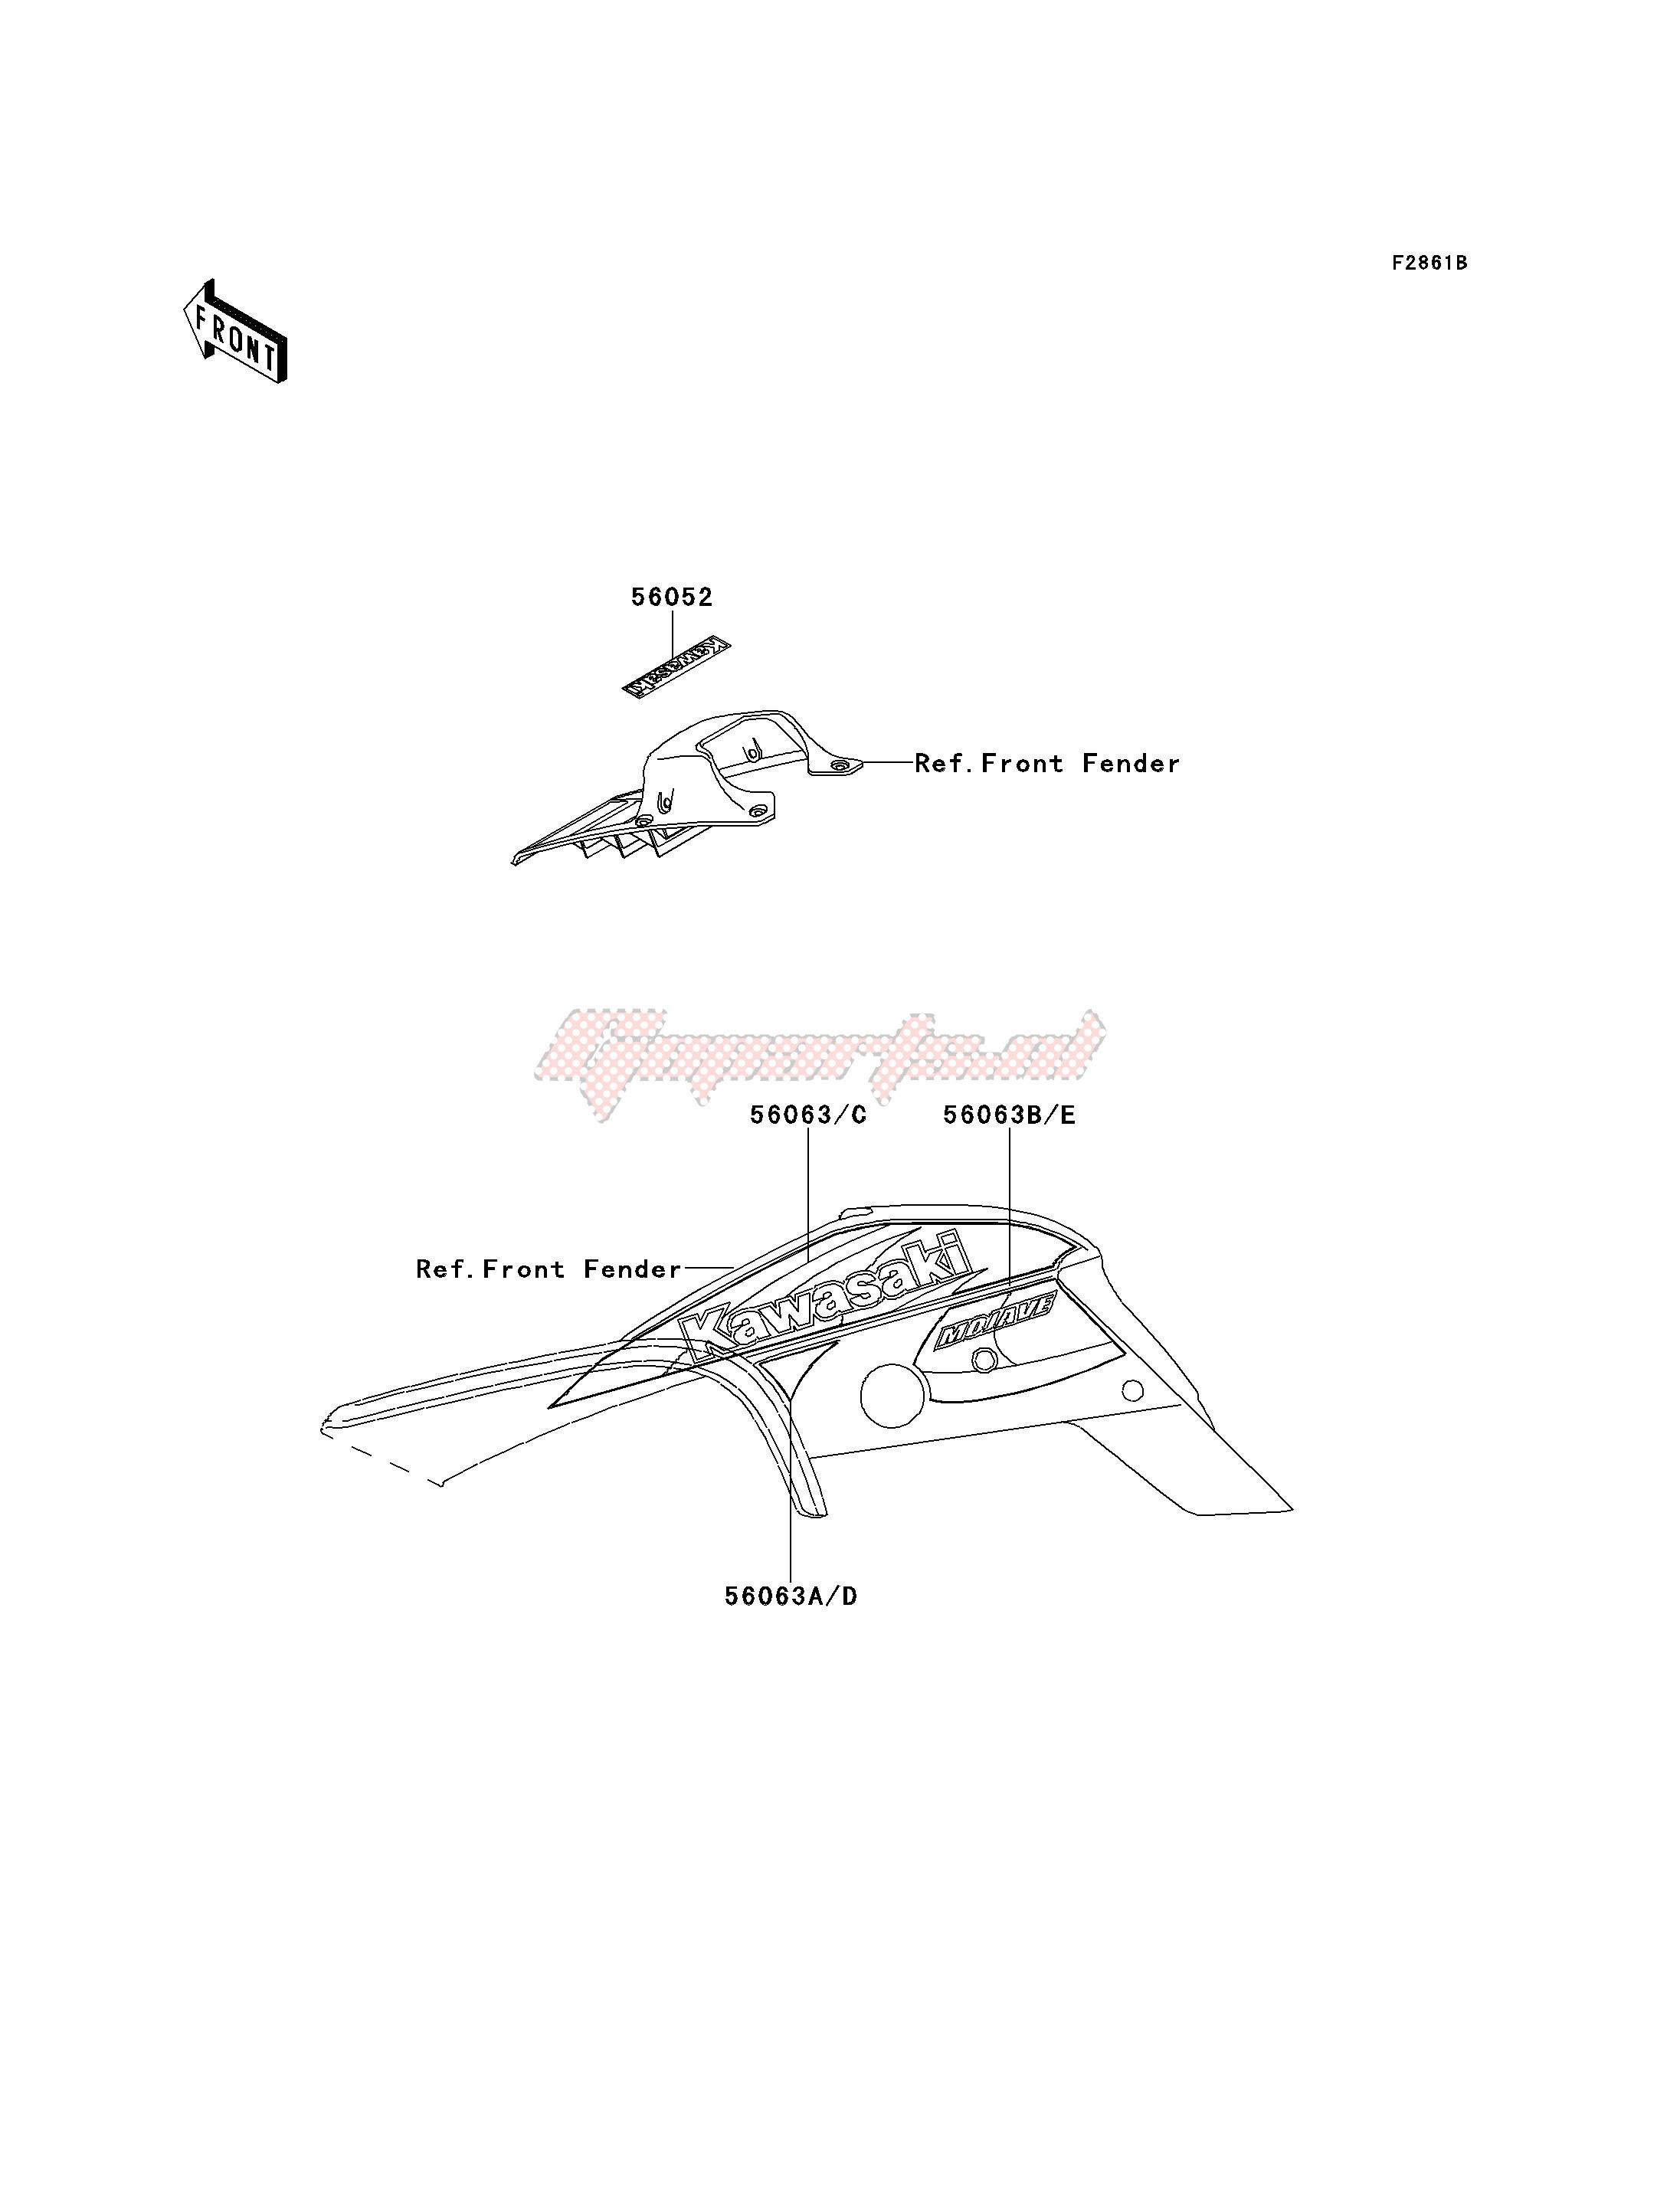 DECALS-- KSF250-A14- - image